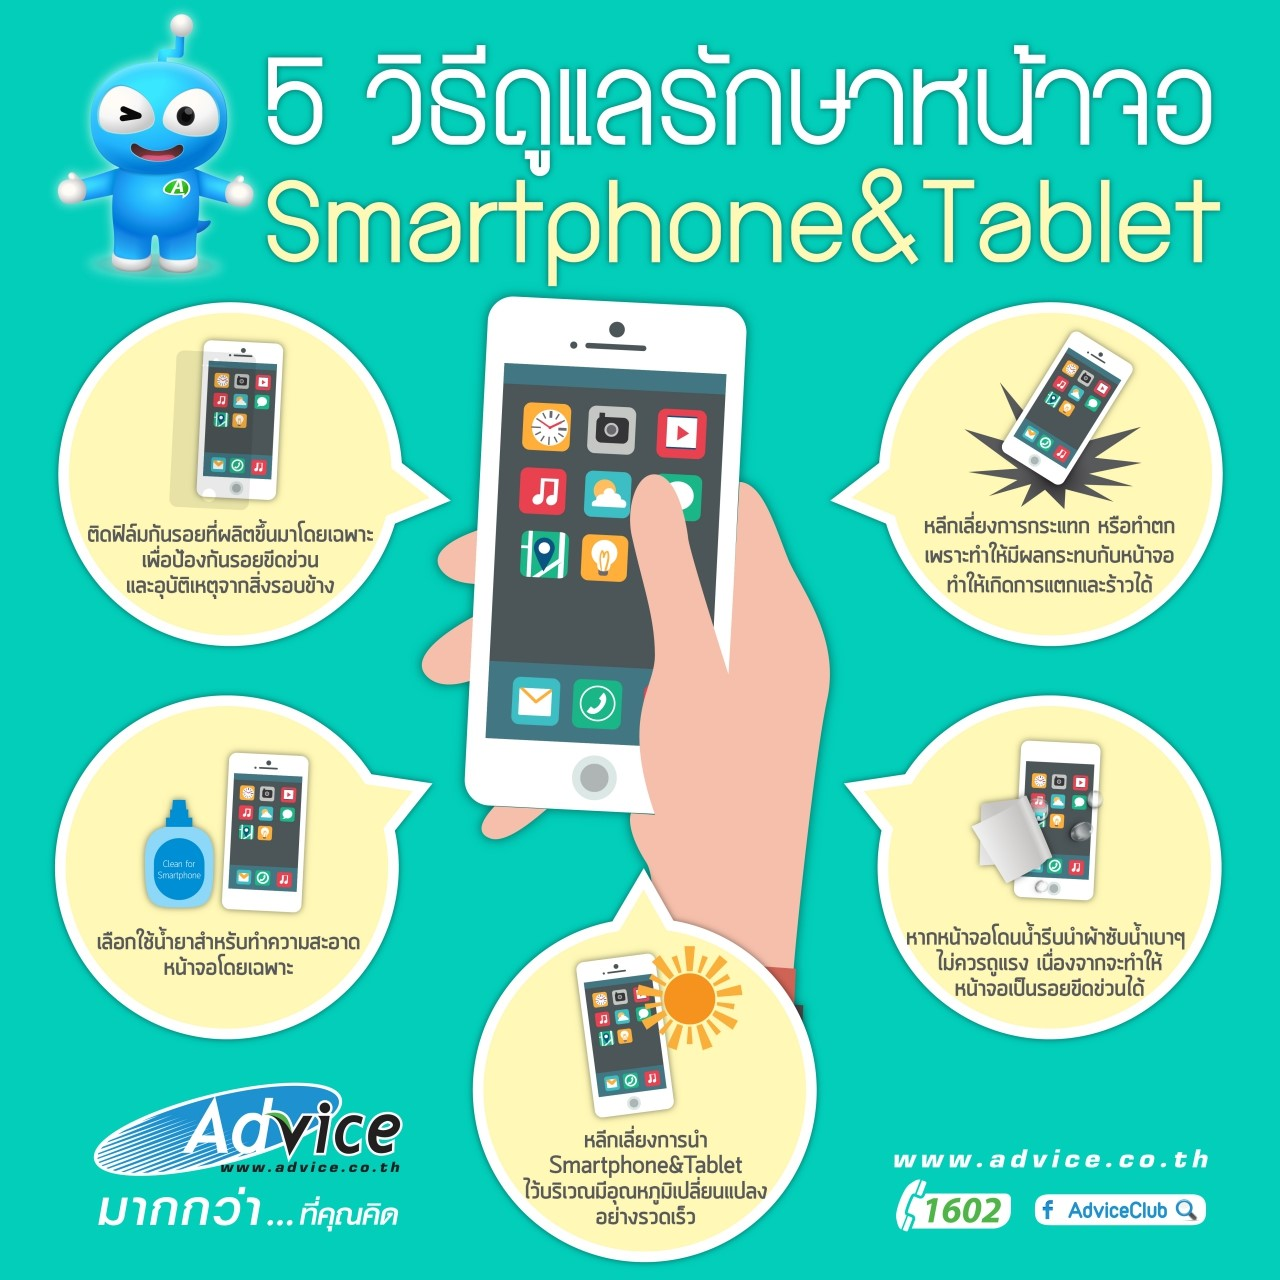 5SmartphoneTablet-01-01